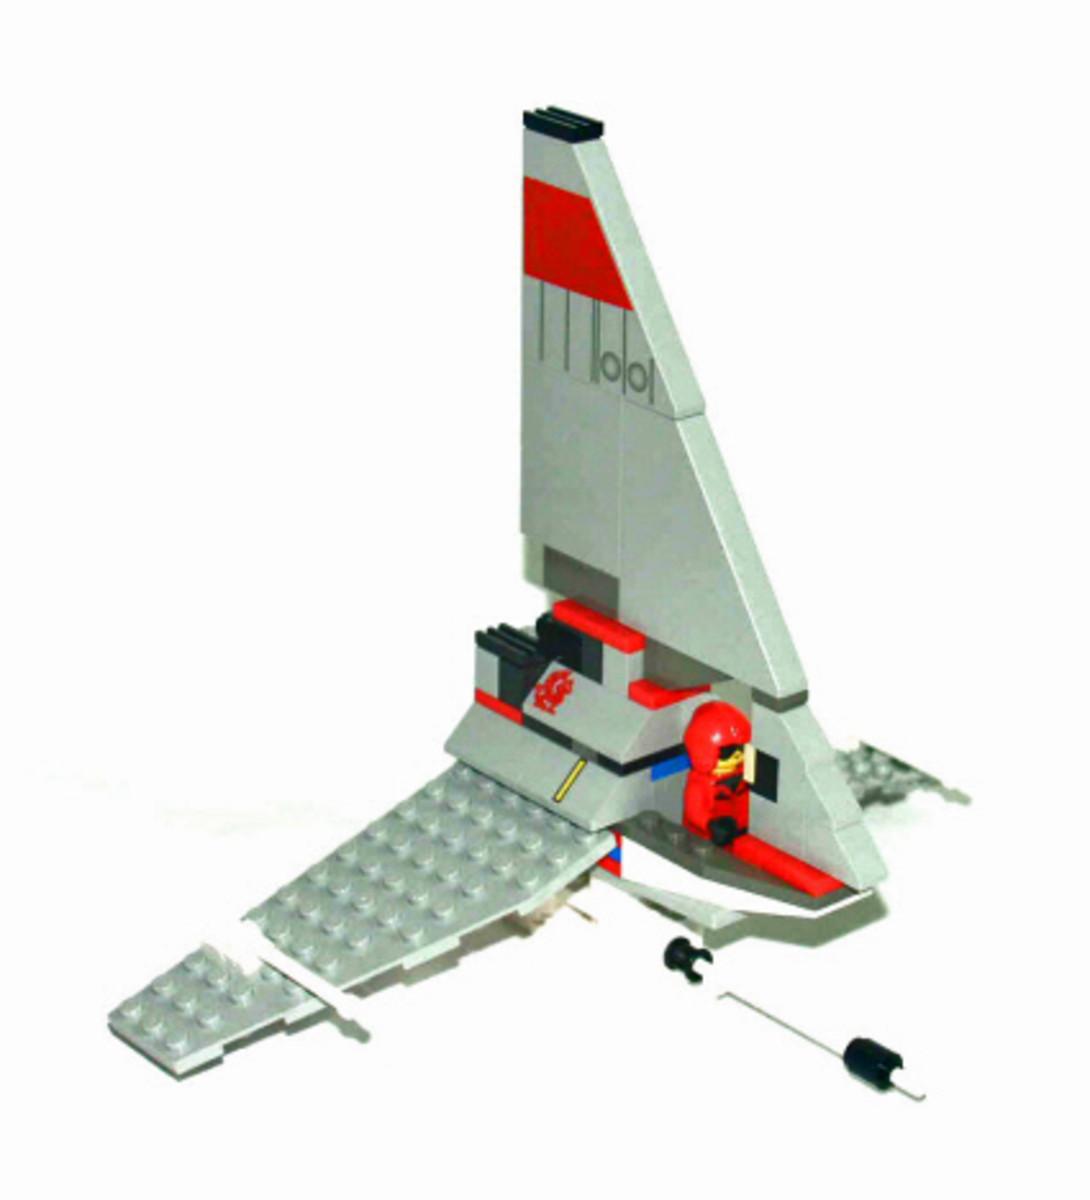 LEGO Star Wars T-16 Skyhopper 4477 Assembled